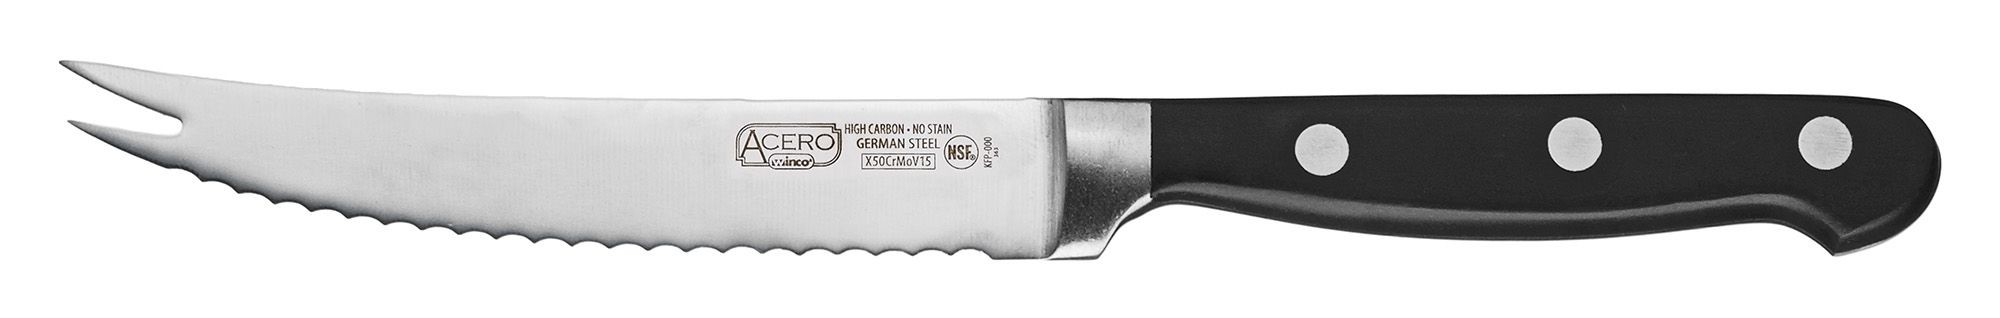 "Winco KFP-51 Acero 5"" Tomato Knife"